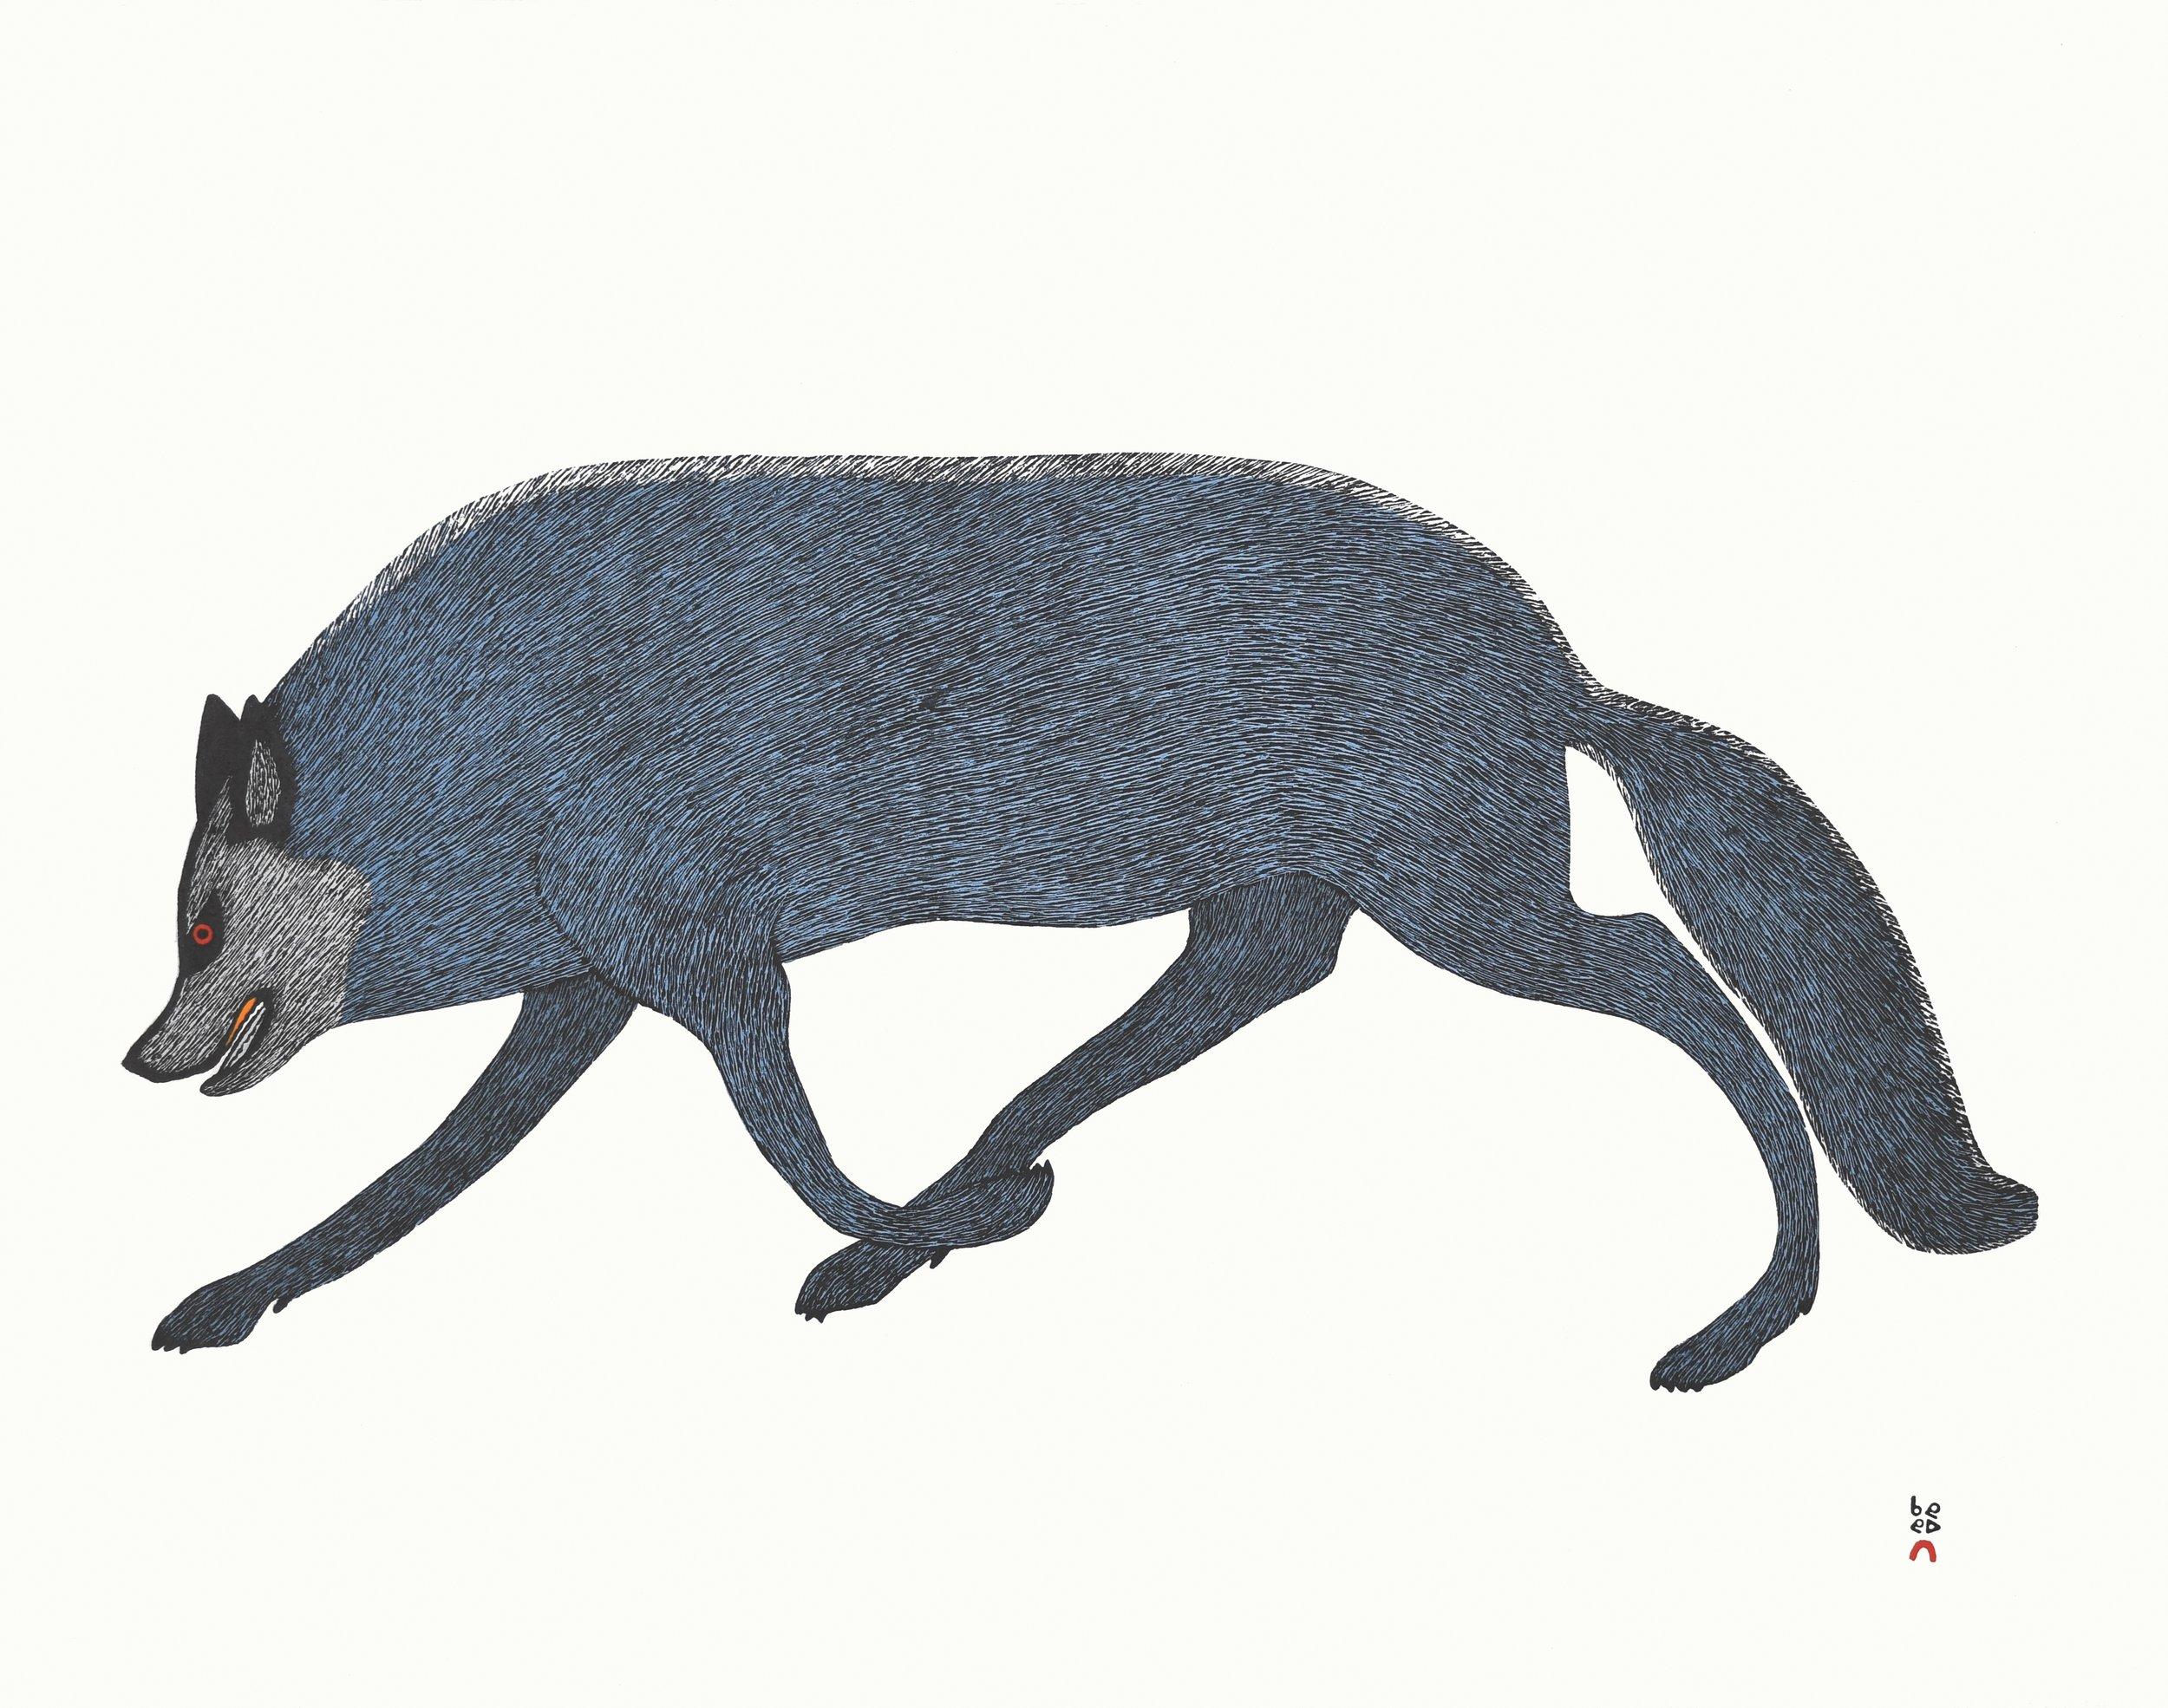 QUVIANAQTUK PUDLAT  32. Tundra Wolf  Stonecut  Paper: Kizuki Kozo White  Printer: Qavavau Manumie  61.8 x 79.2 cm  $ 900